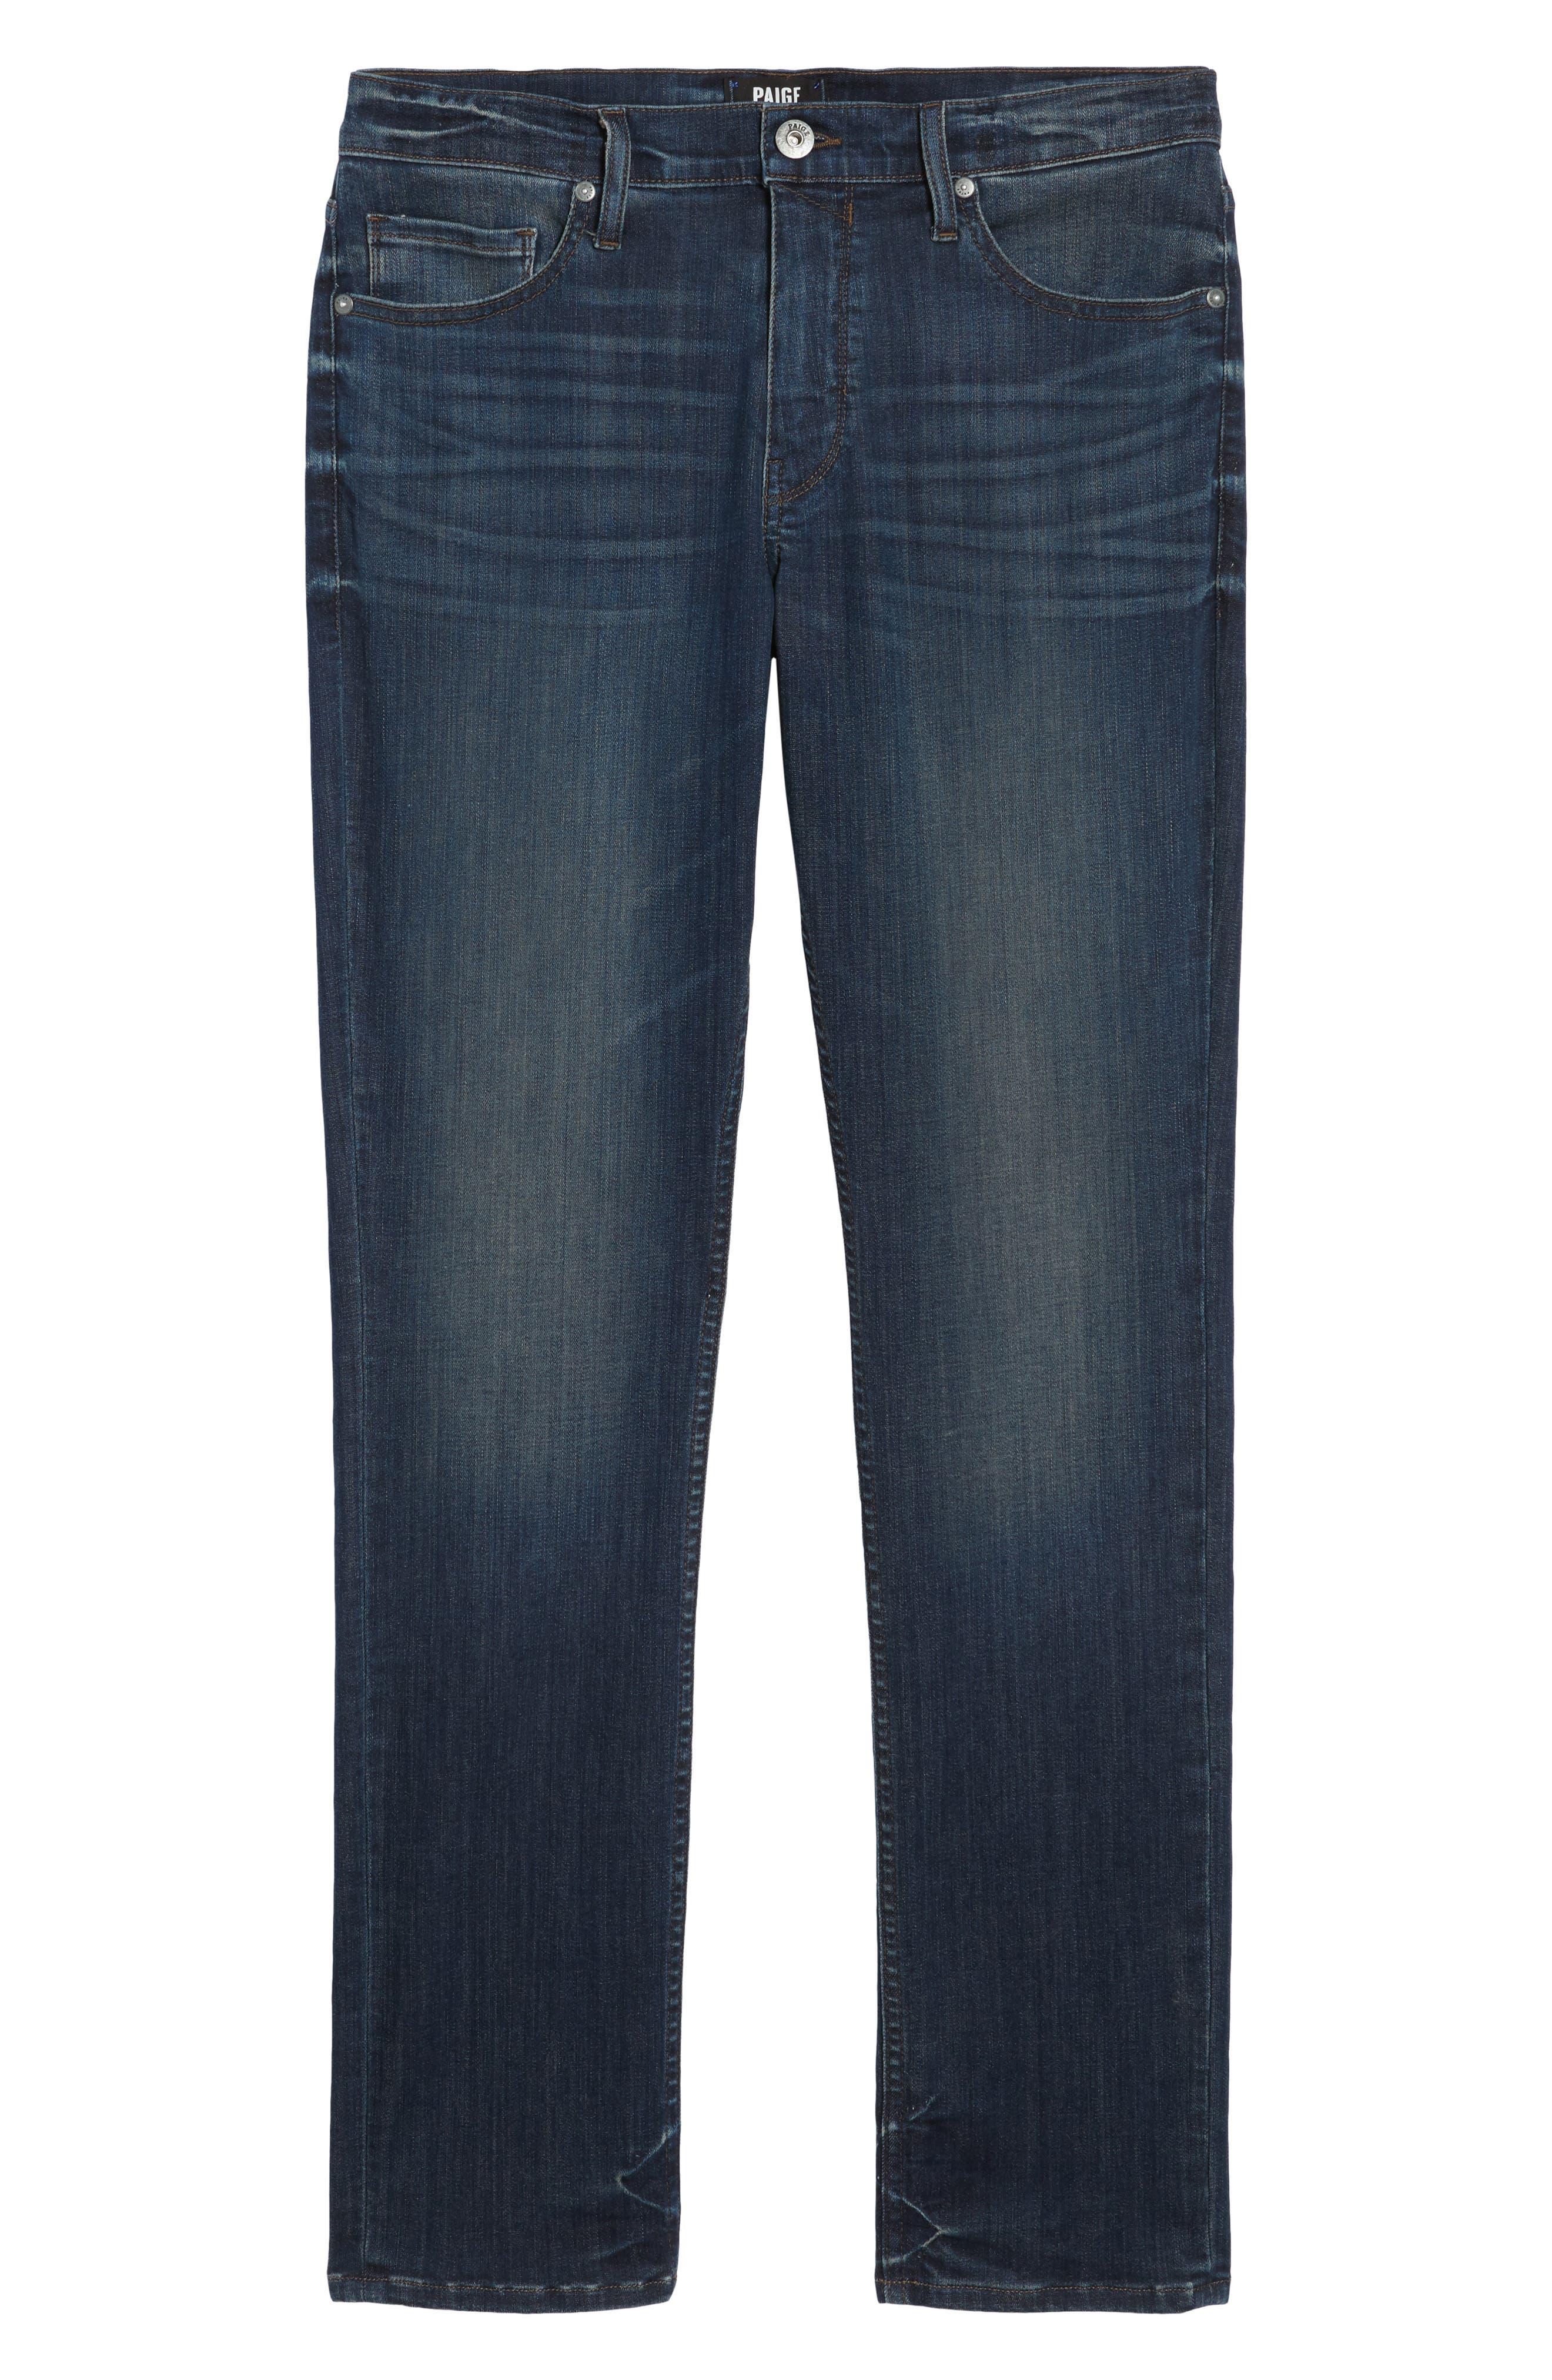 Transcend - Lennox Slim Fit Jeans,                             Alternate thumbnail 6, color,                             Freeman